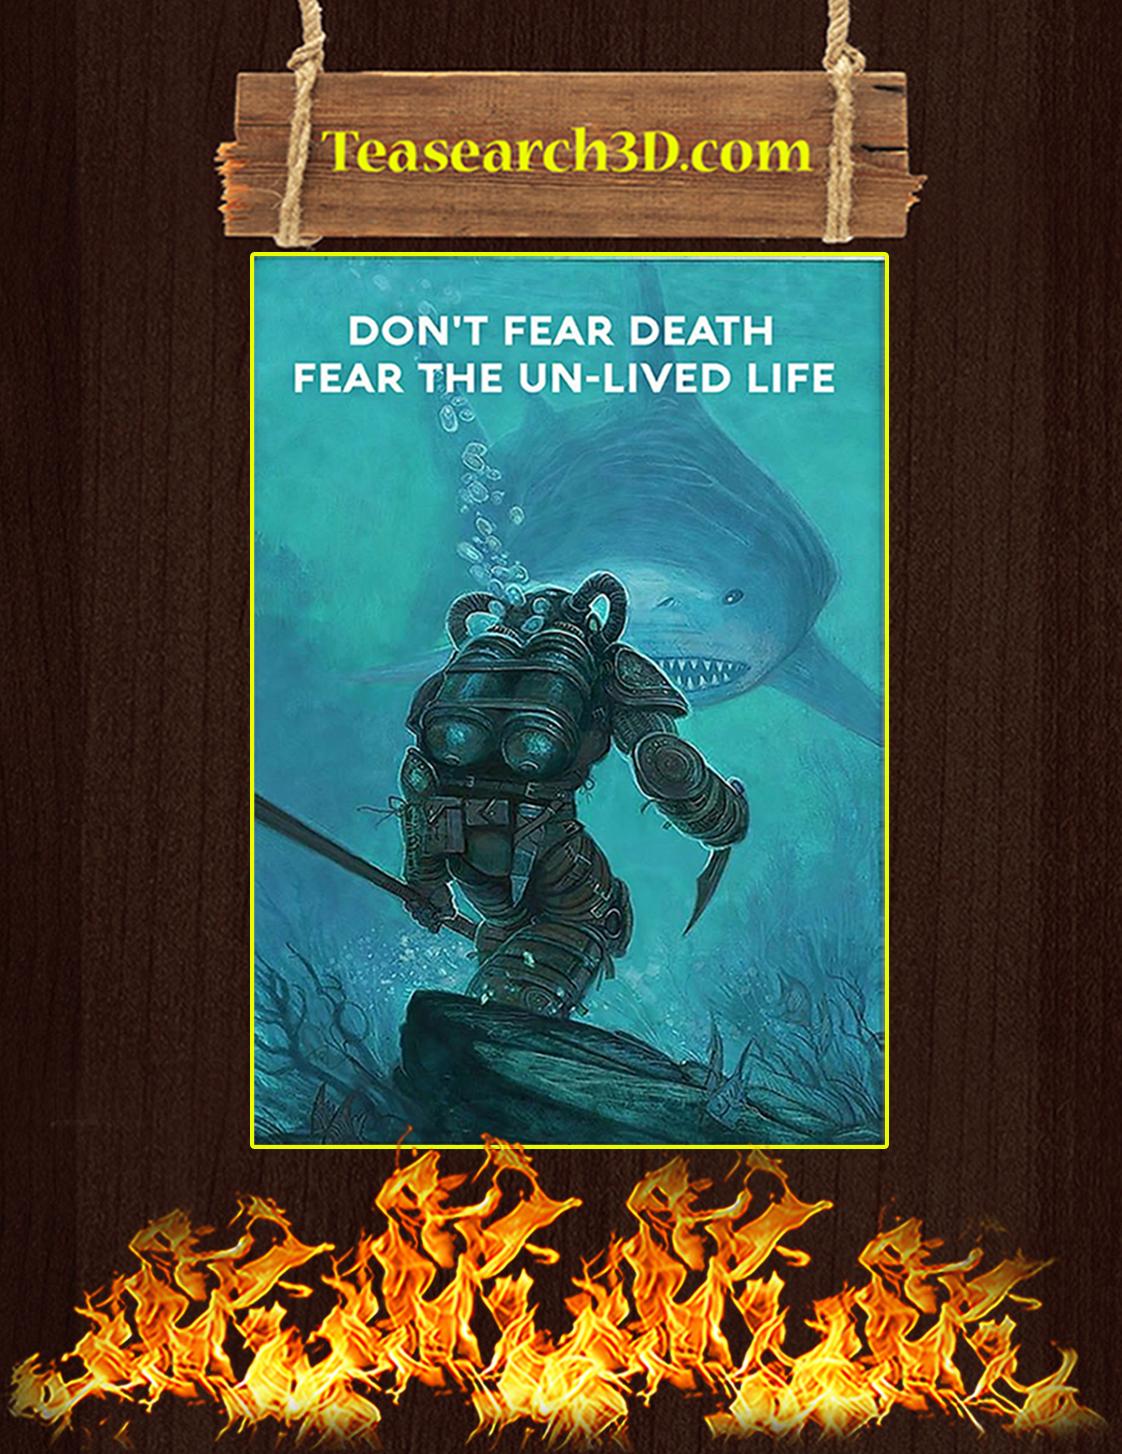 Scuba diving Don't fear death fear the un-lived life poster A3